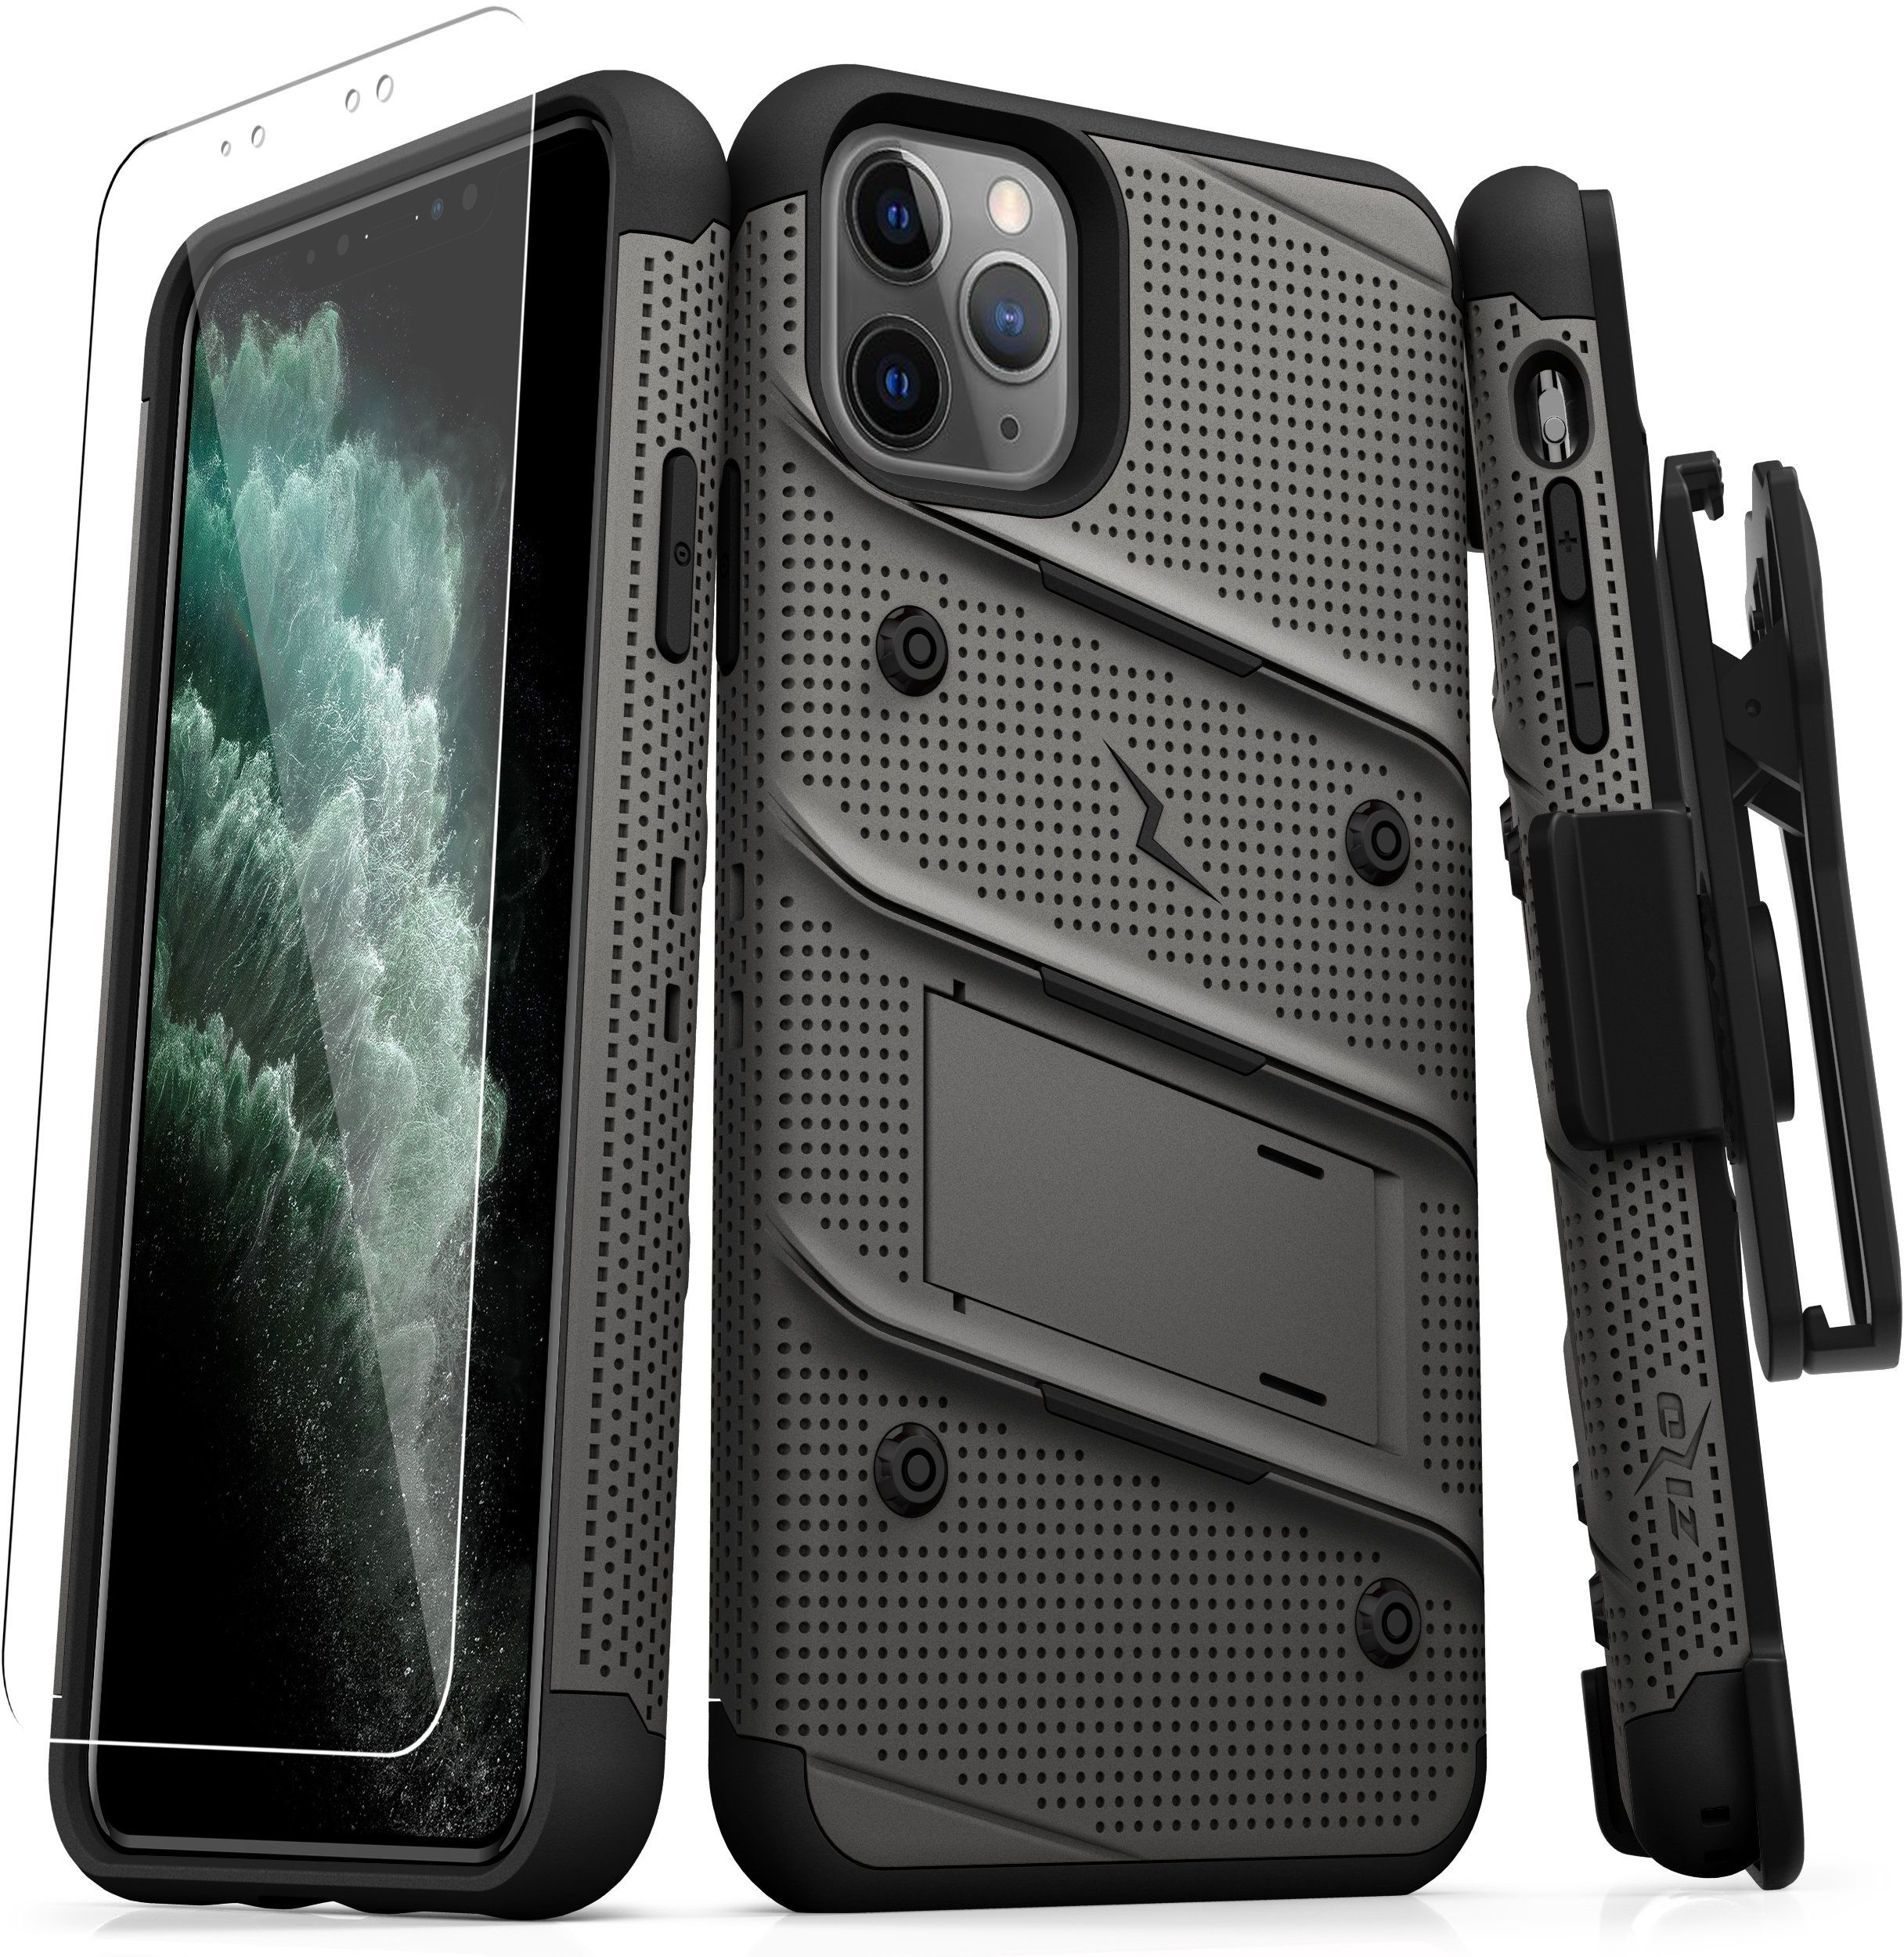 Zizo Bolt Cover Etui Pancerne do iPhone 11 Pro Max ze Szkłem 9H na Ekran + Podstawka & Uchwyt do Paska (Gun Metal Gray & Black)